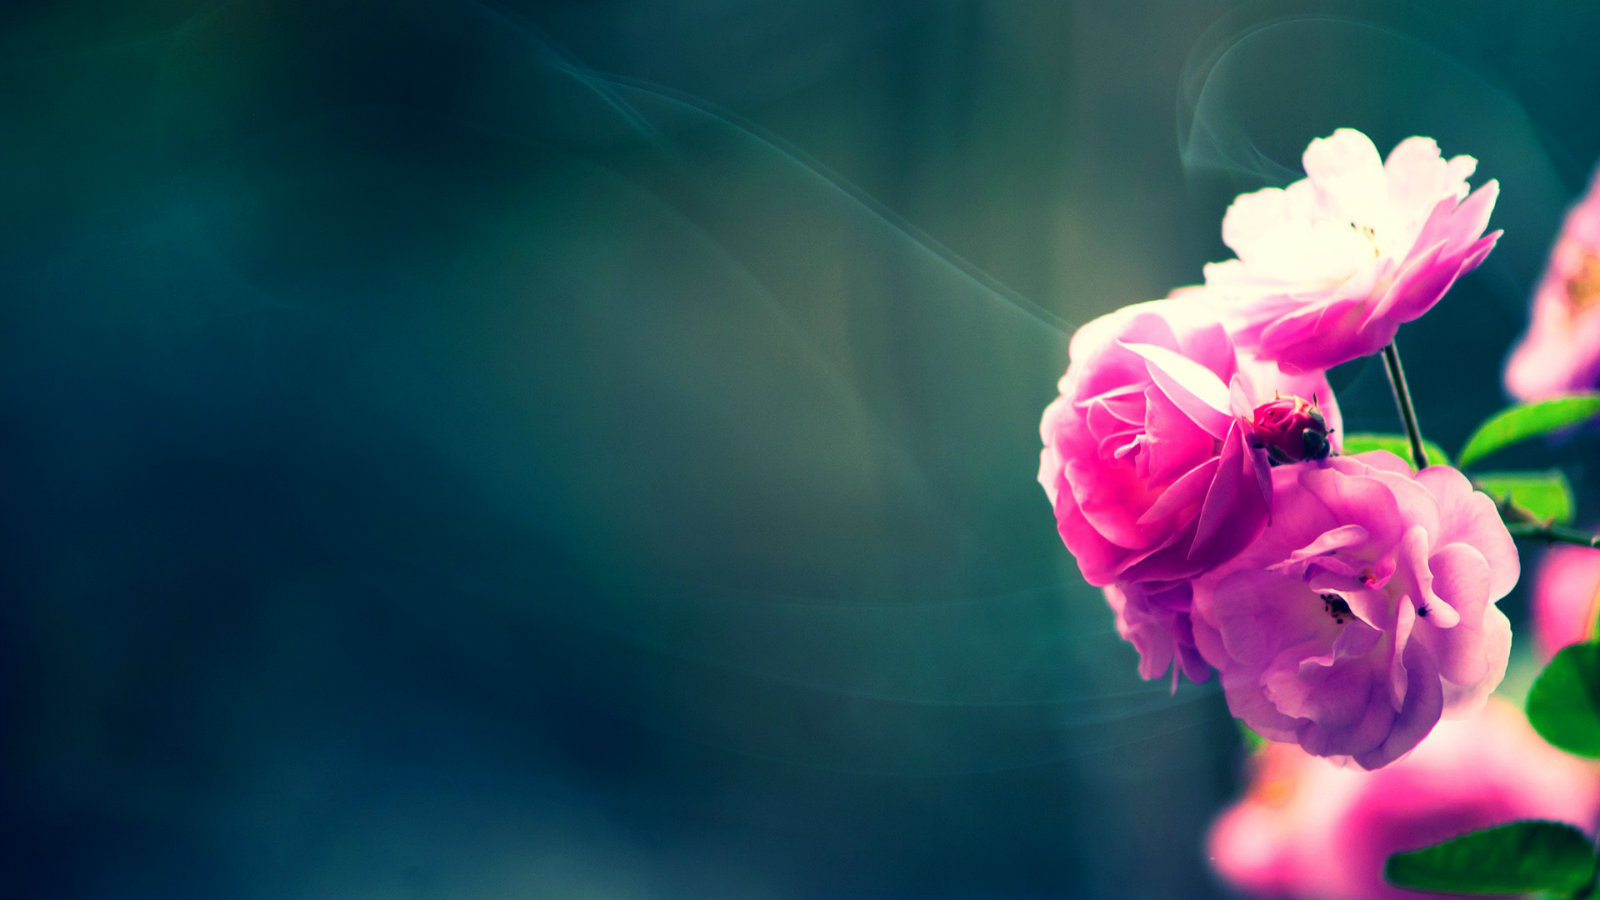 Download Beautiful Pink Rose Wallpaper Most HD Wallpapers 1600x900